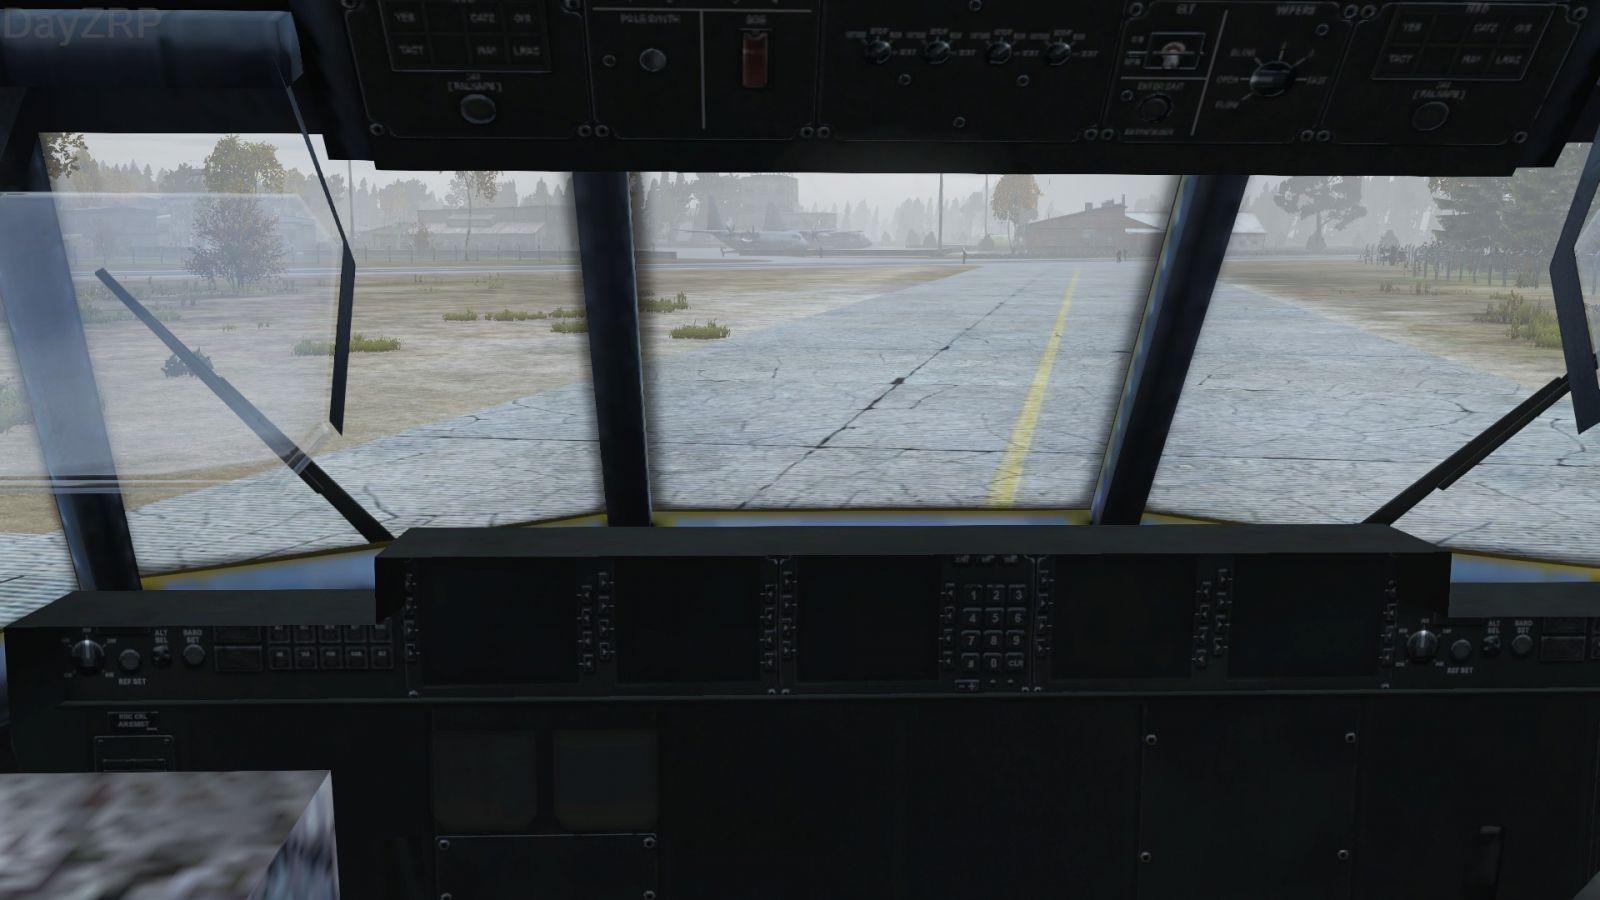 Ready to take off?